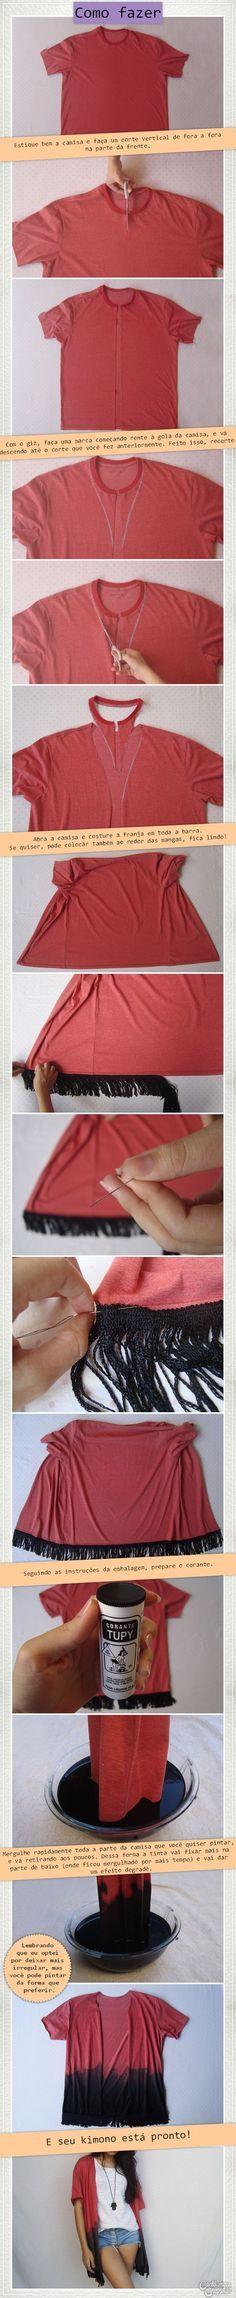 D.I.Y Kimono fashion #cademeuchapeu http://www.cademeuchapeu.com/2014/01/09/d-i-y-kimono-fashion/